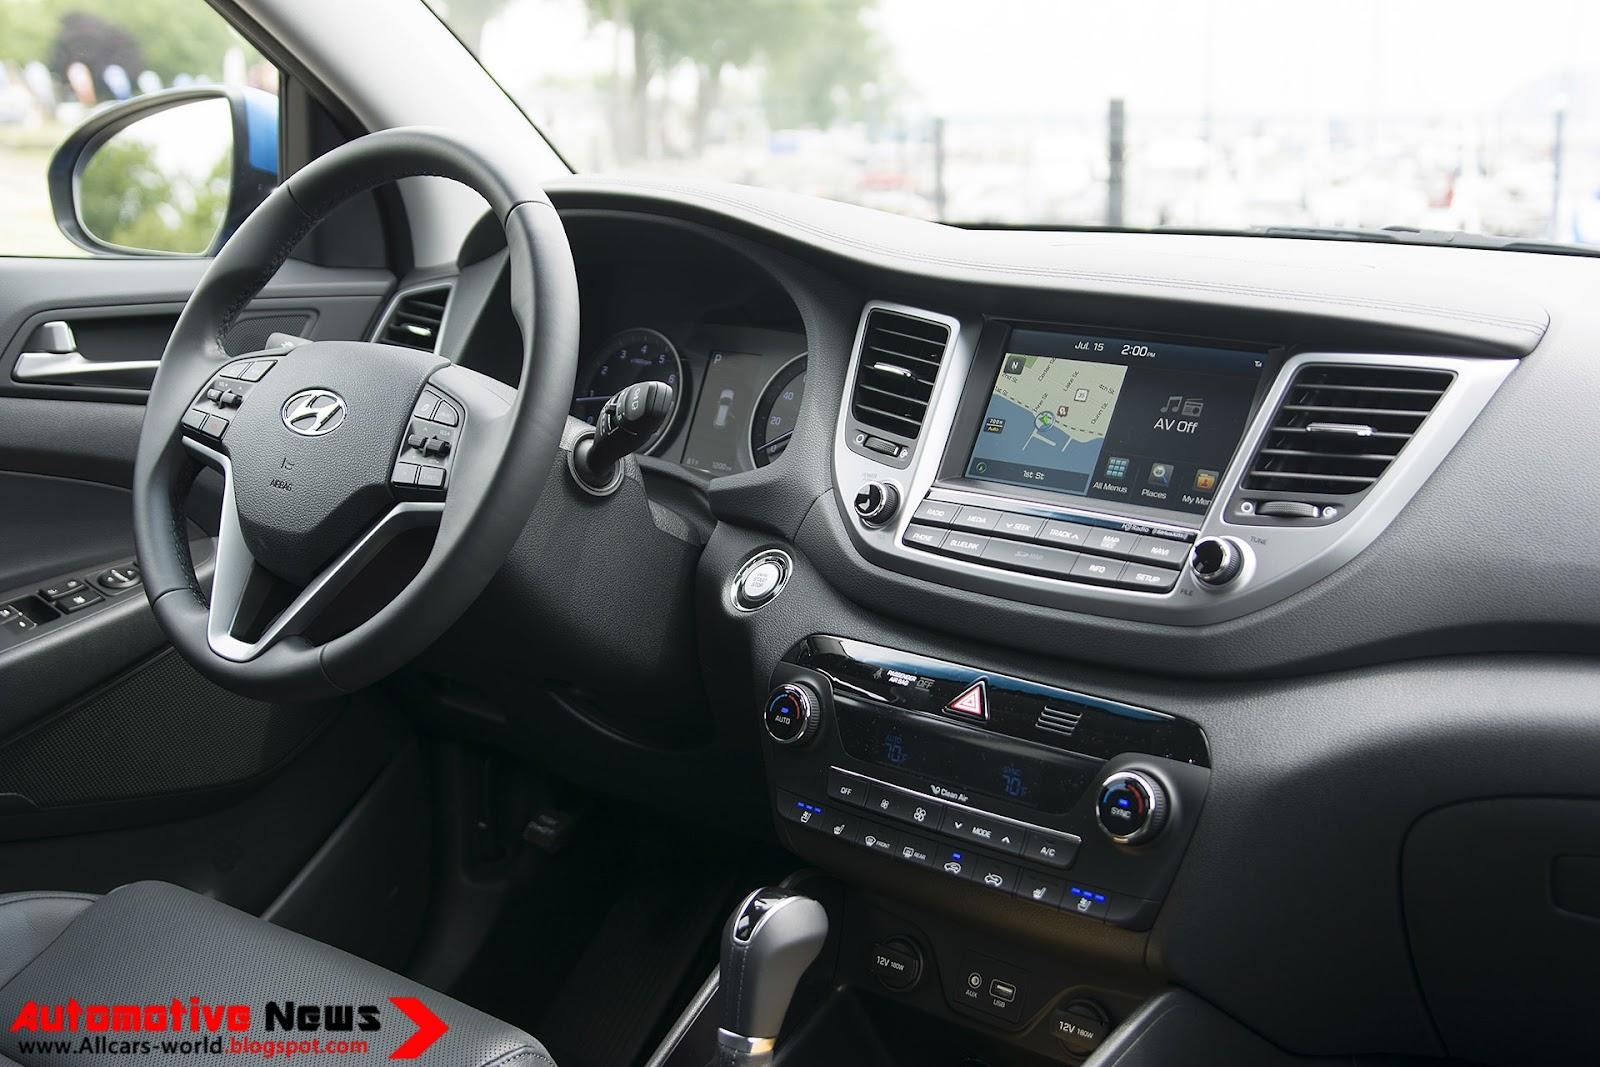 Automotive news 2016 hyundai tucson review - Hyundai tucson interior pictures ...